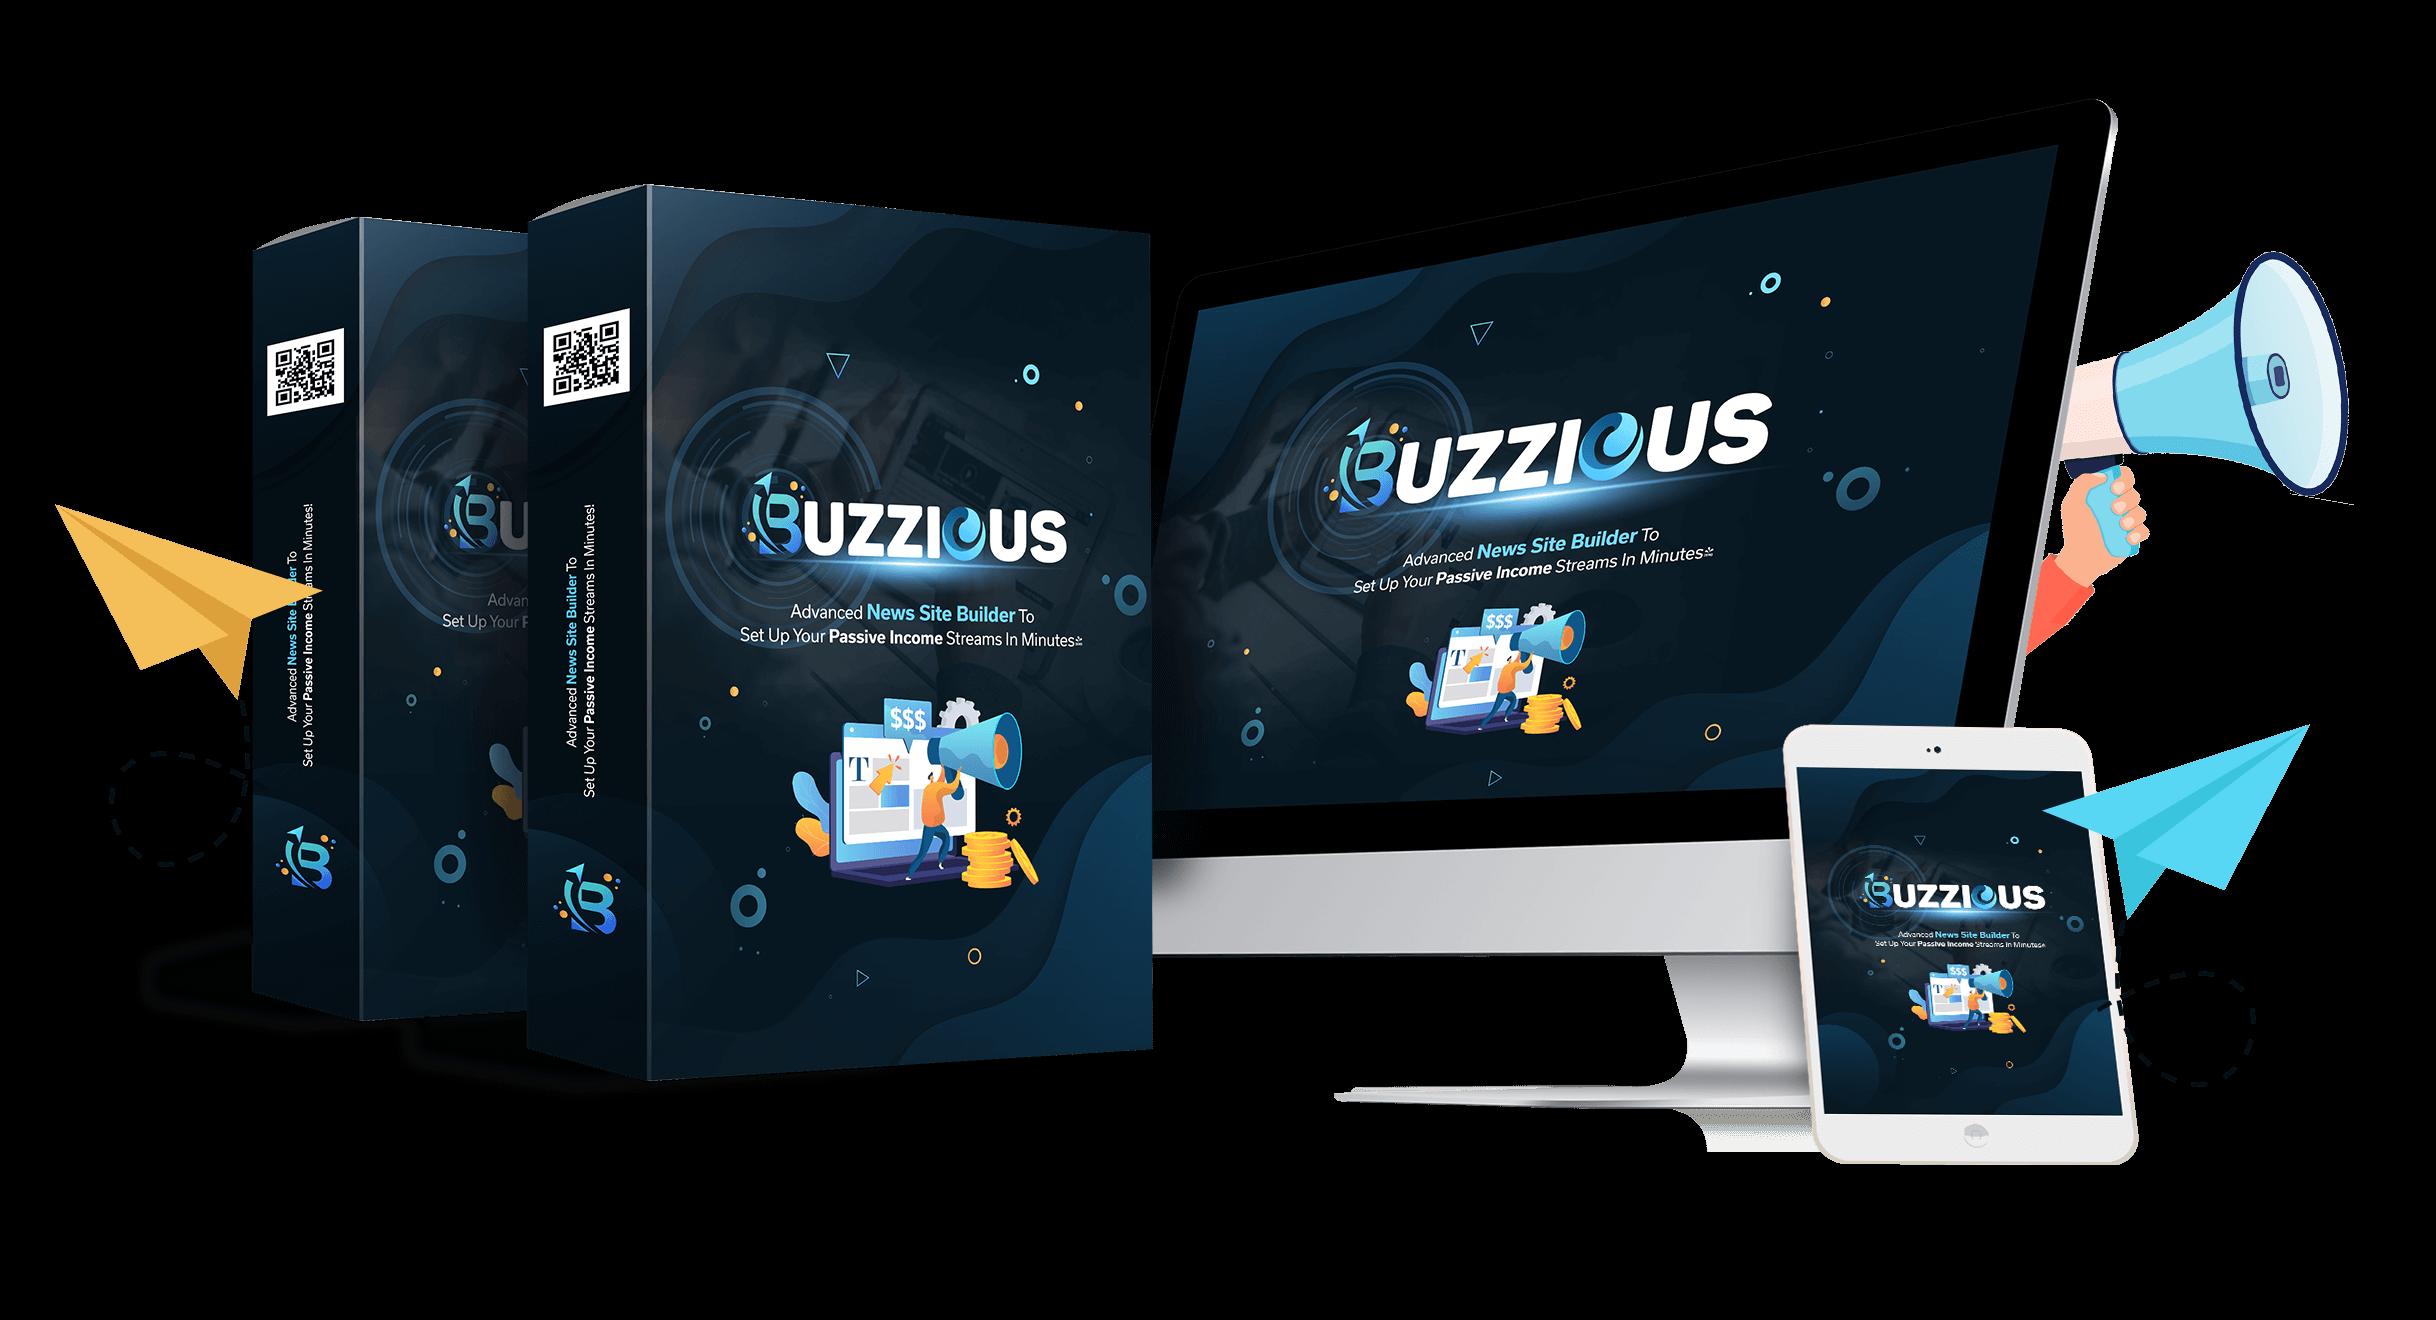 Buzzious-review